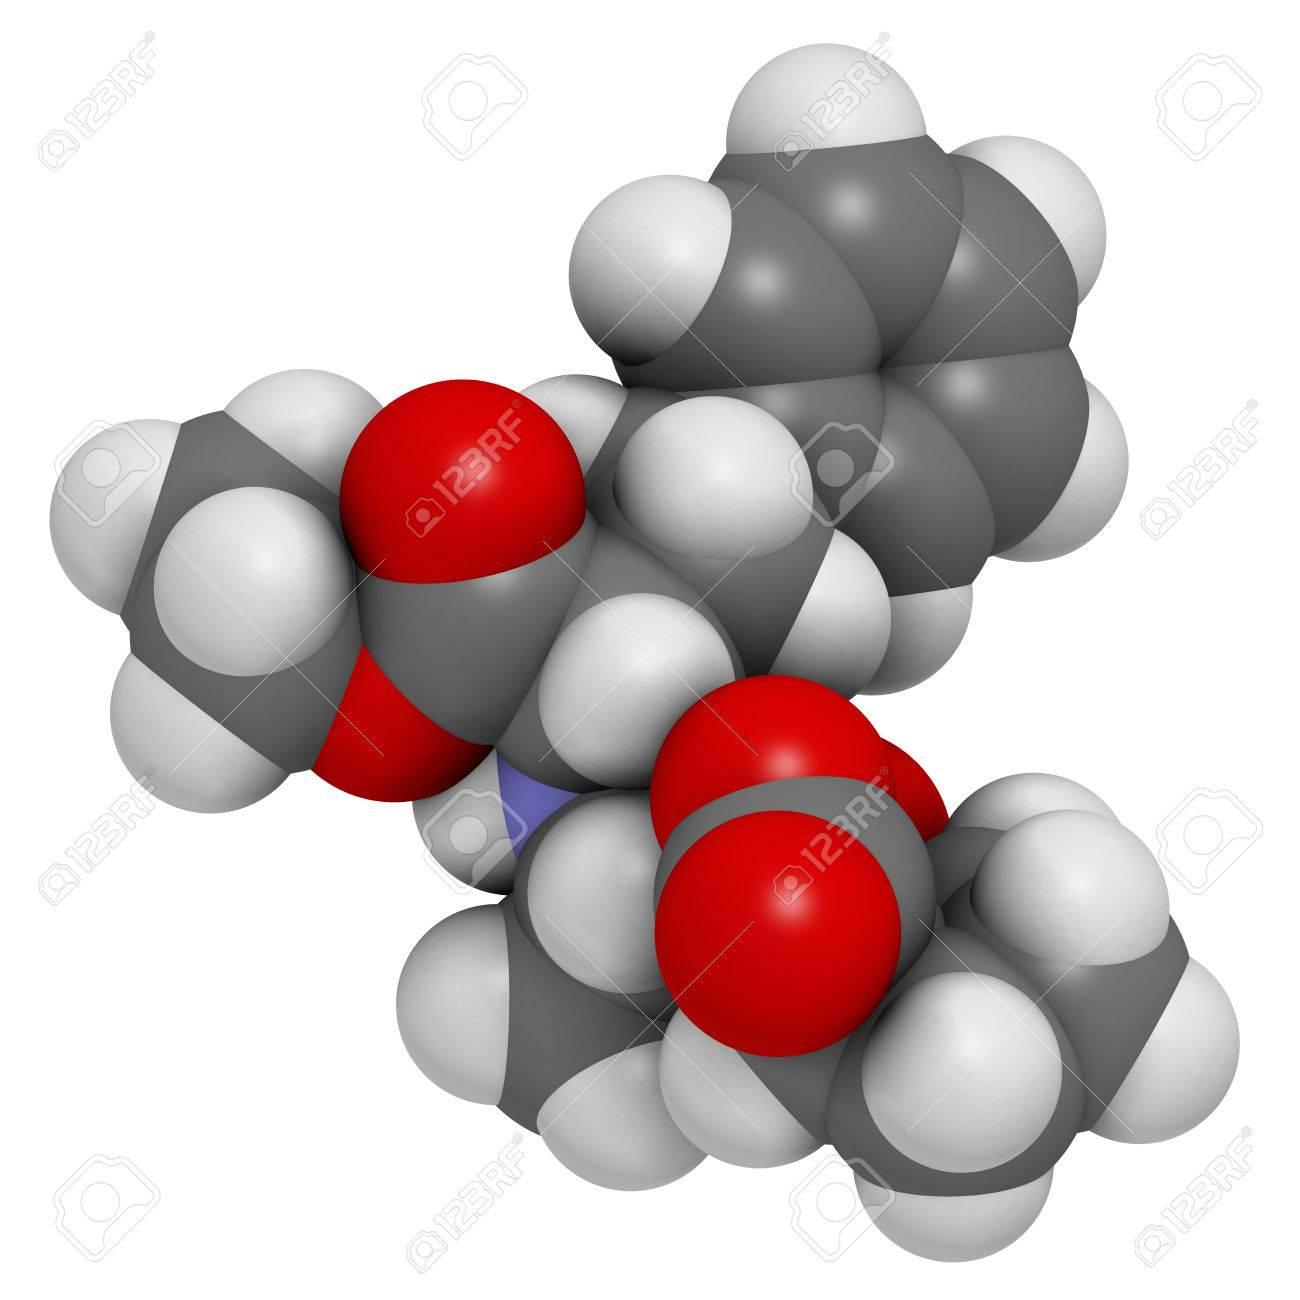 Enalapril high blood pressure drug molecule  Angiotensin Converting